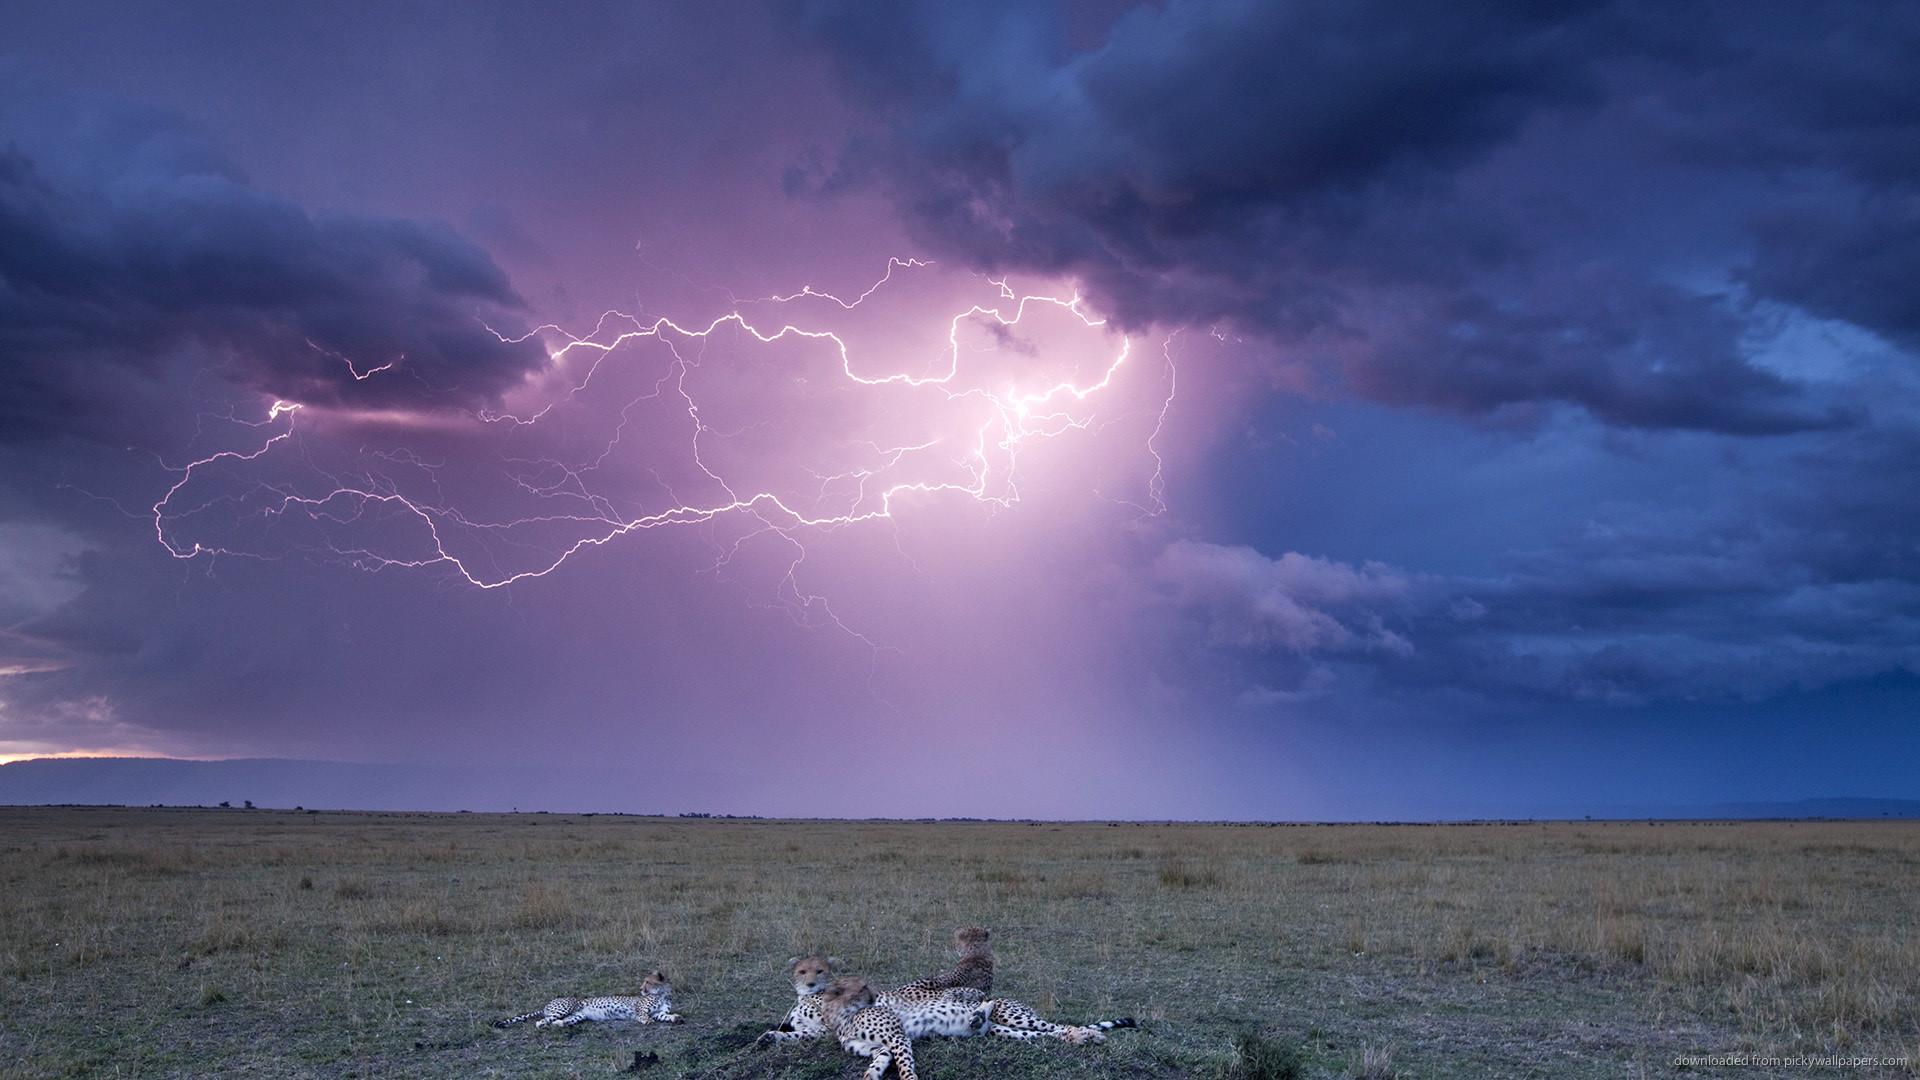 Download Leopards And Lightning Storm Wallpaper